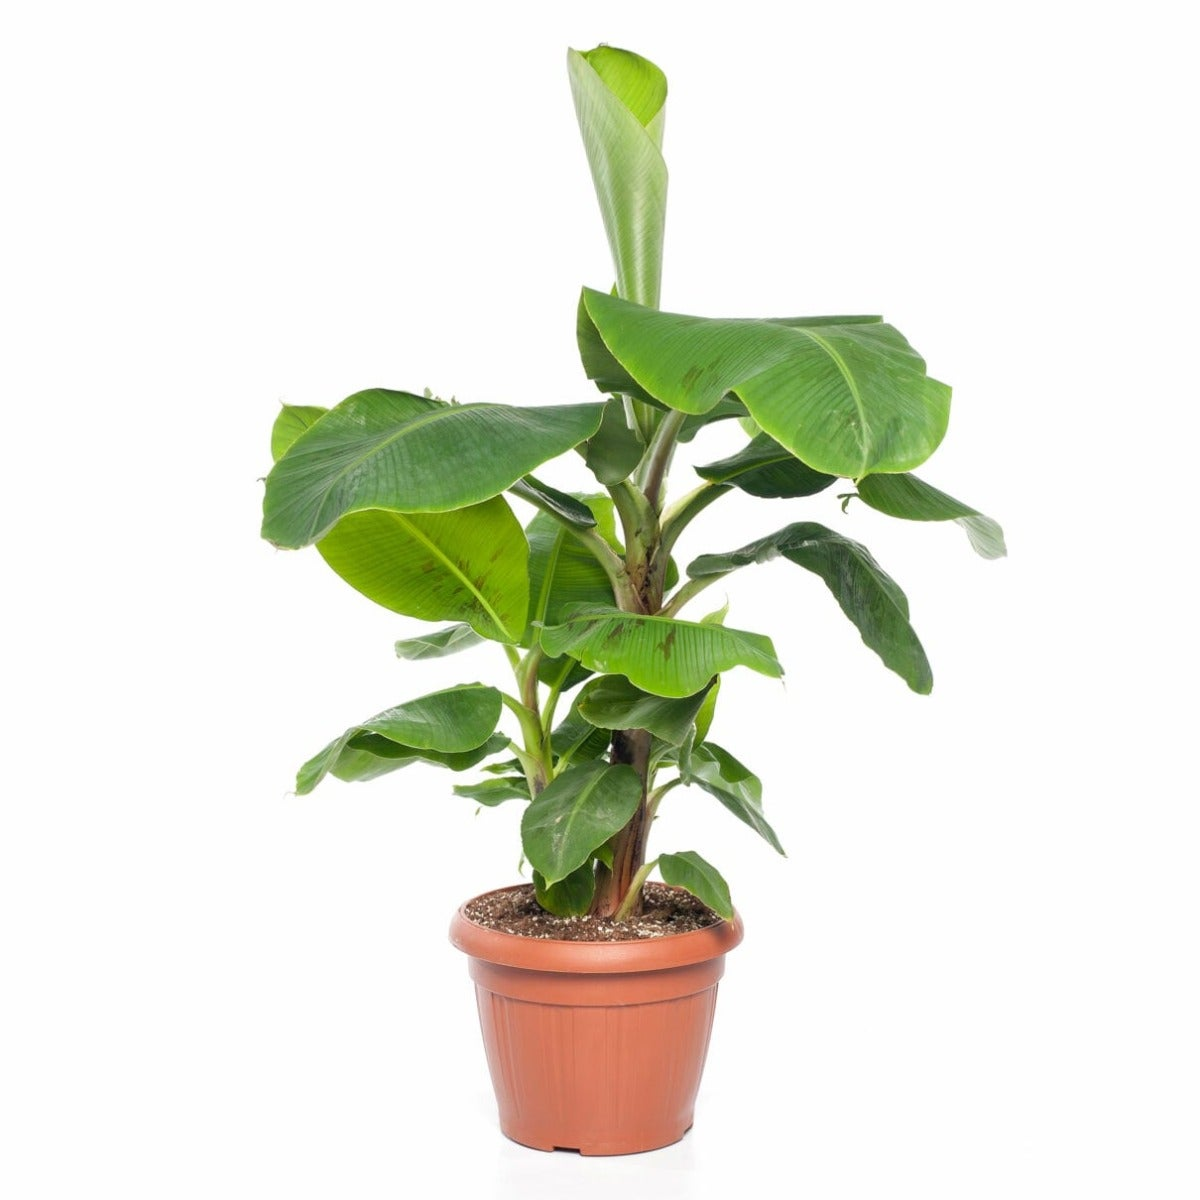 Bananenplant (Musa 'Dwarf Cavendish')